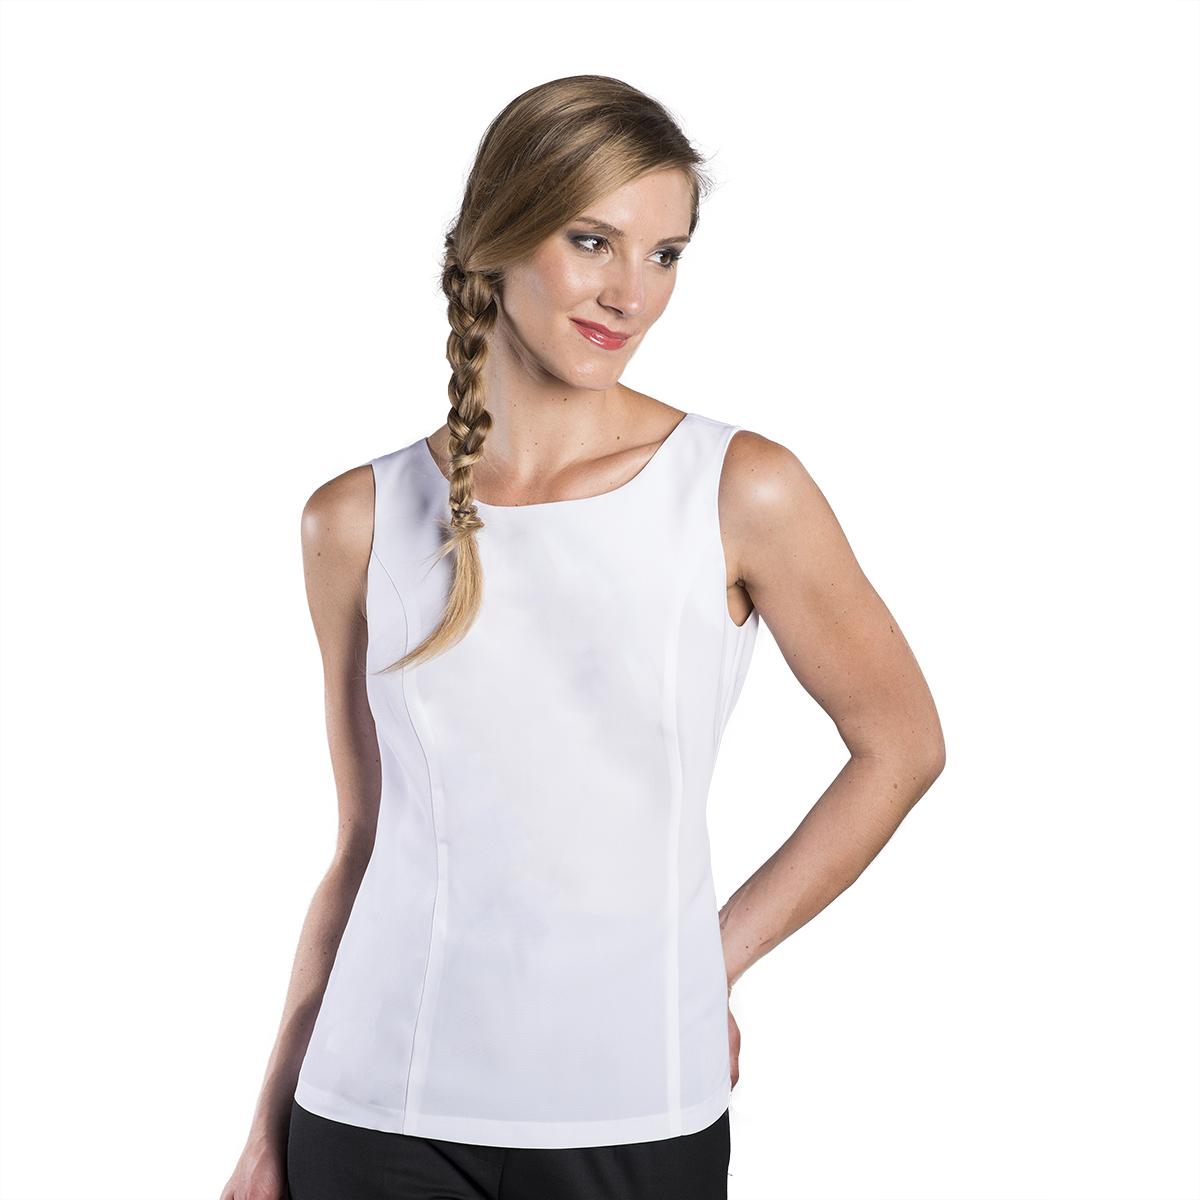 Women's Sleeveless Zipper Back Blouse | Executive Apparel